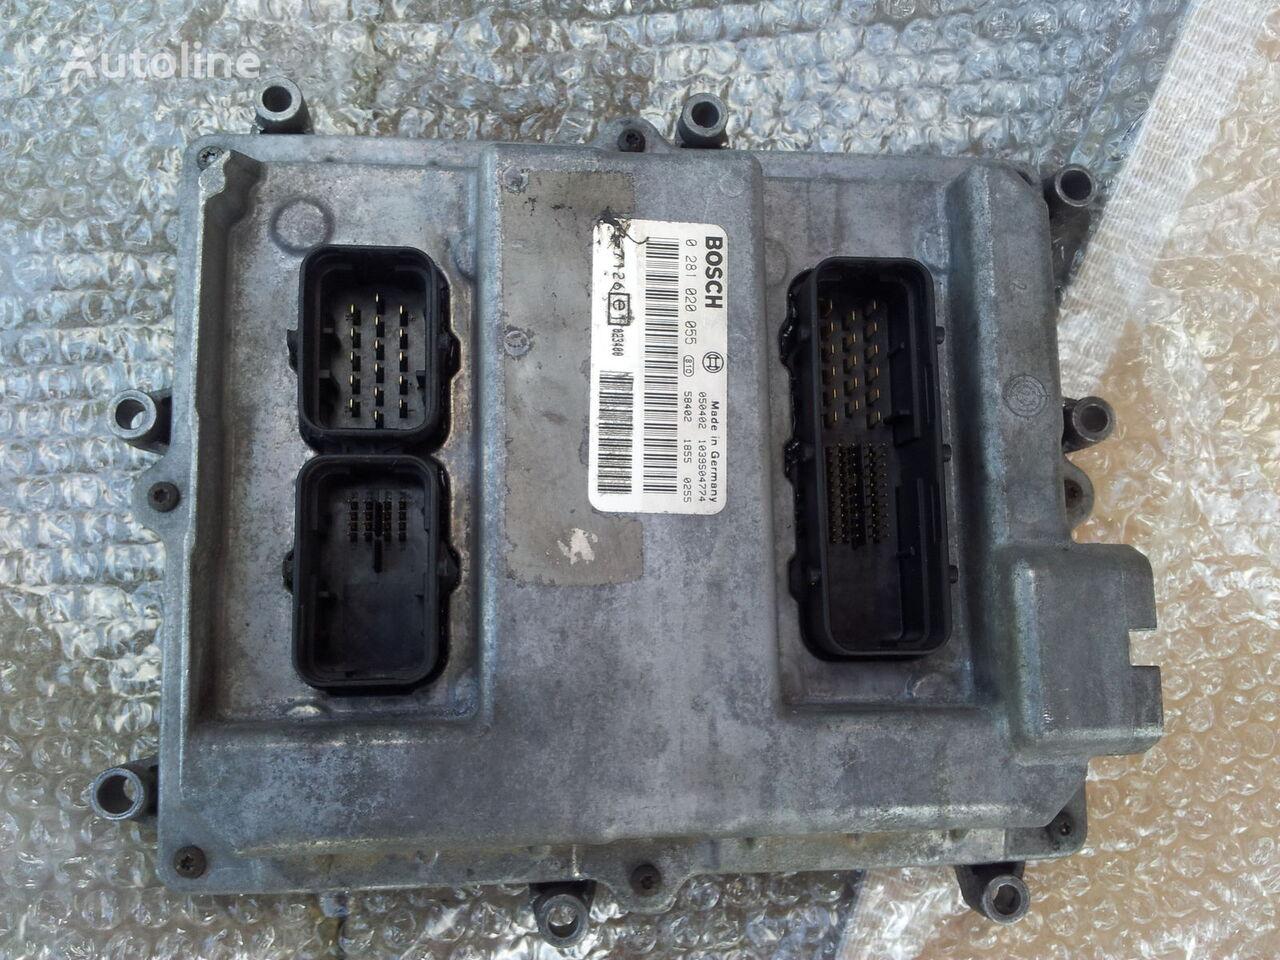 блок управления  MAN Common Rail EDC, ECU electronic diesel control 0281020055, D2066LF01, 51258037126, 51258337169, 51258037127, 51258337168 для тягача MAN TGA